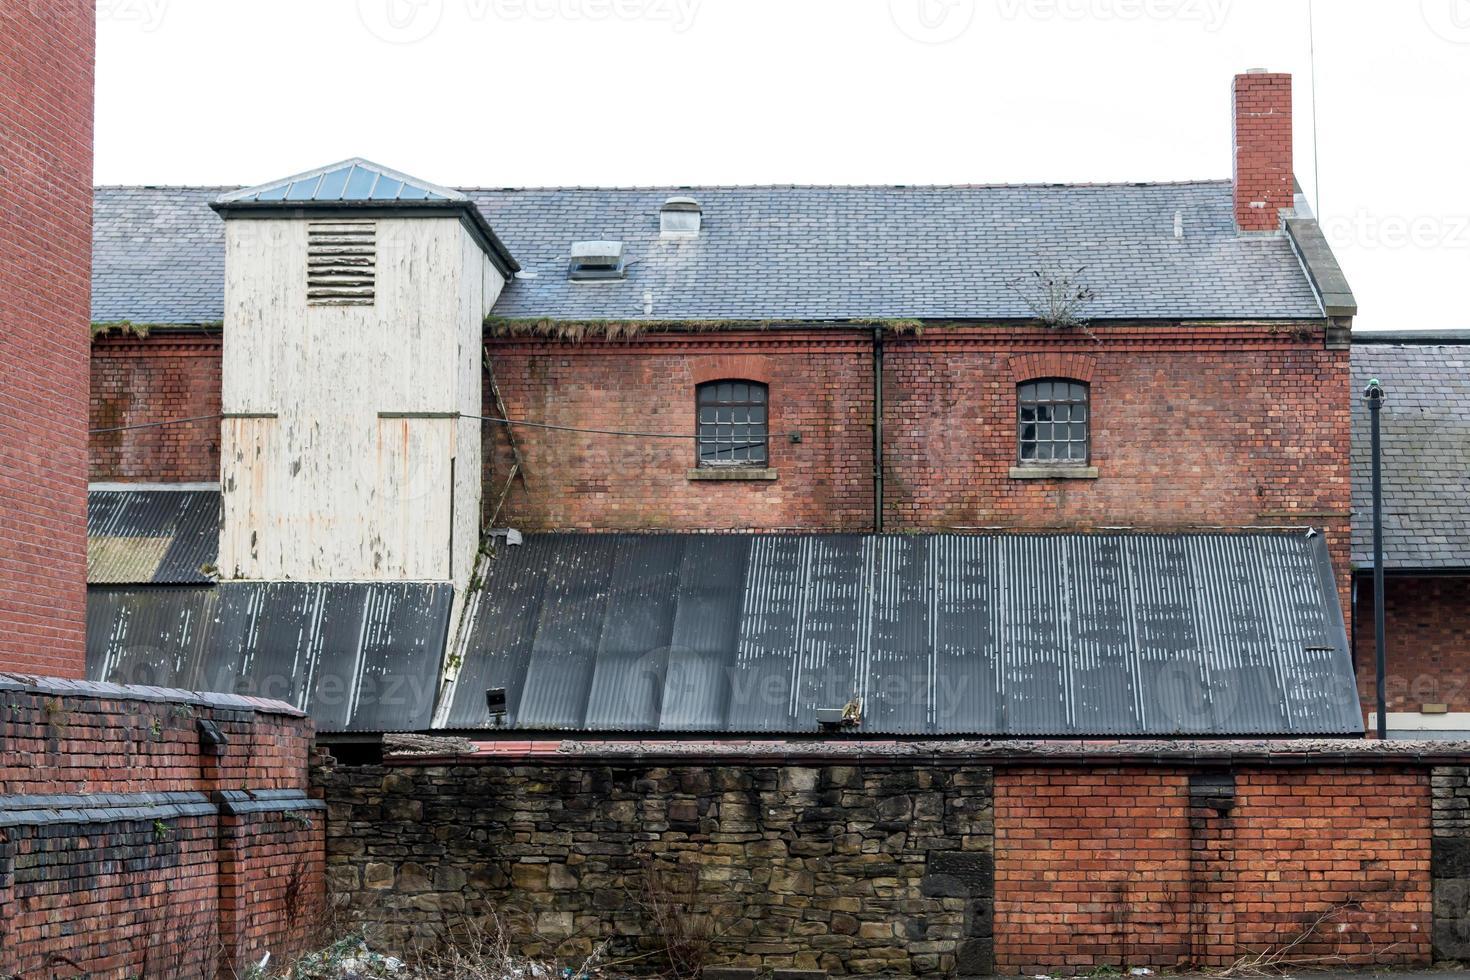 Urban Decay Scene photo